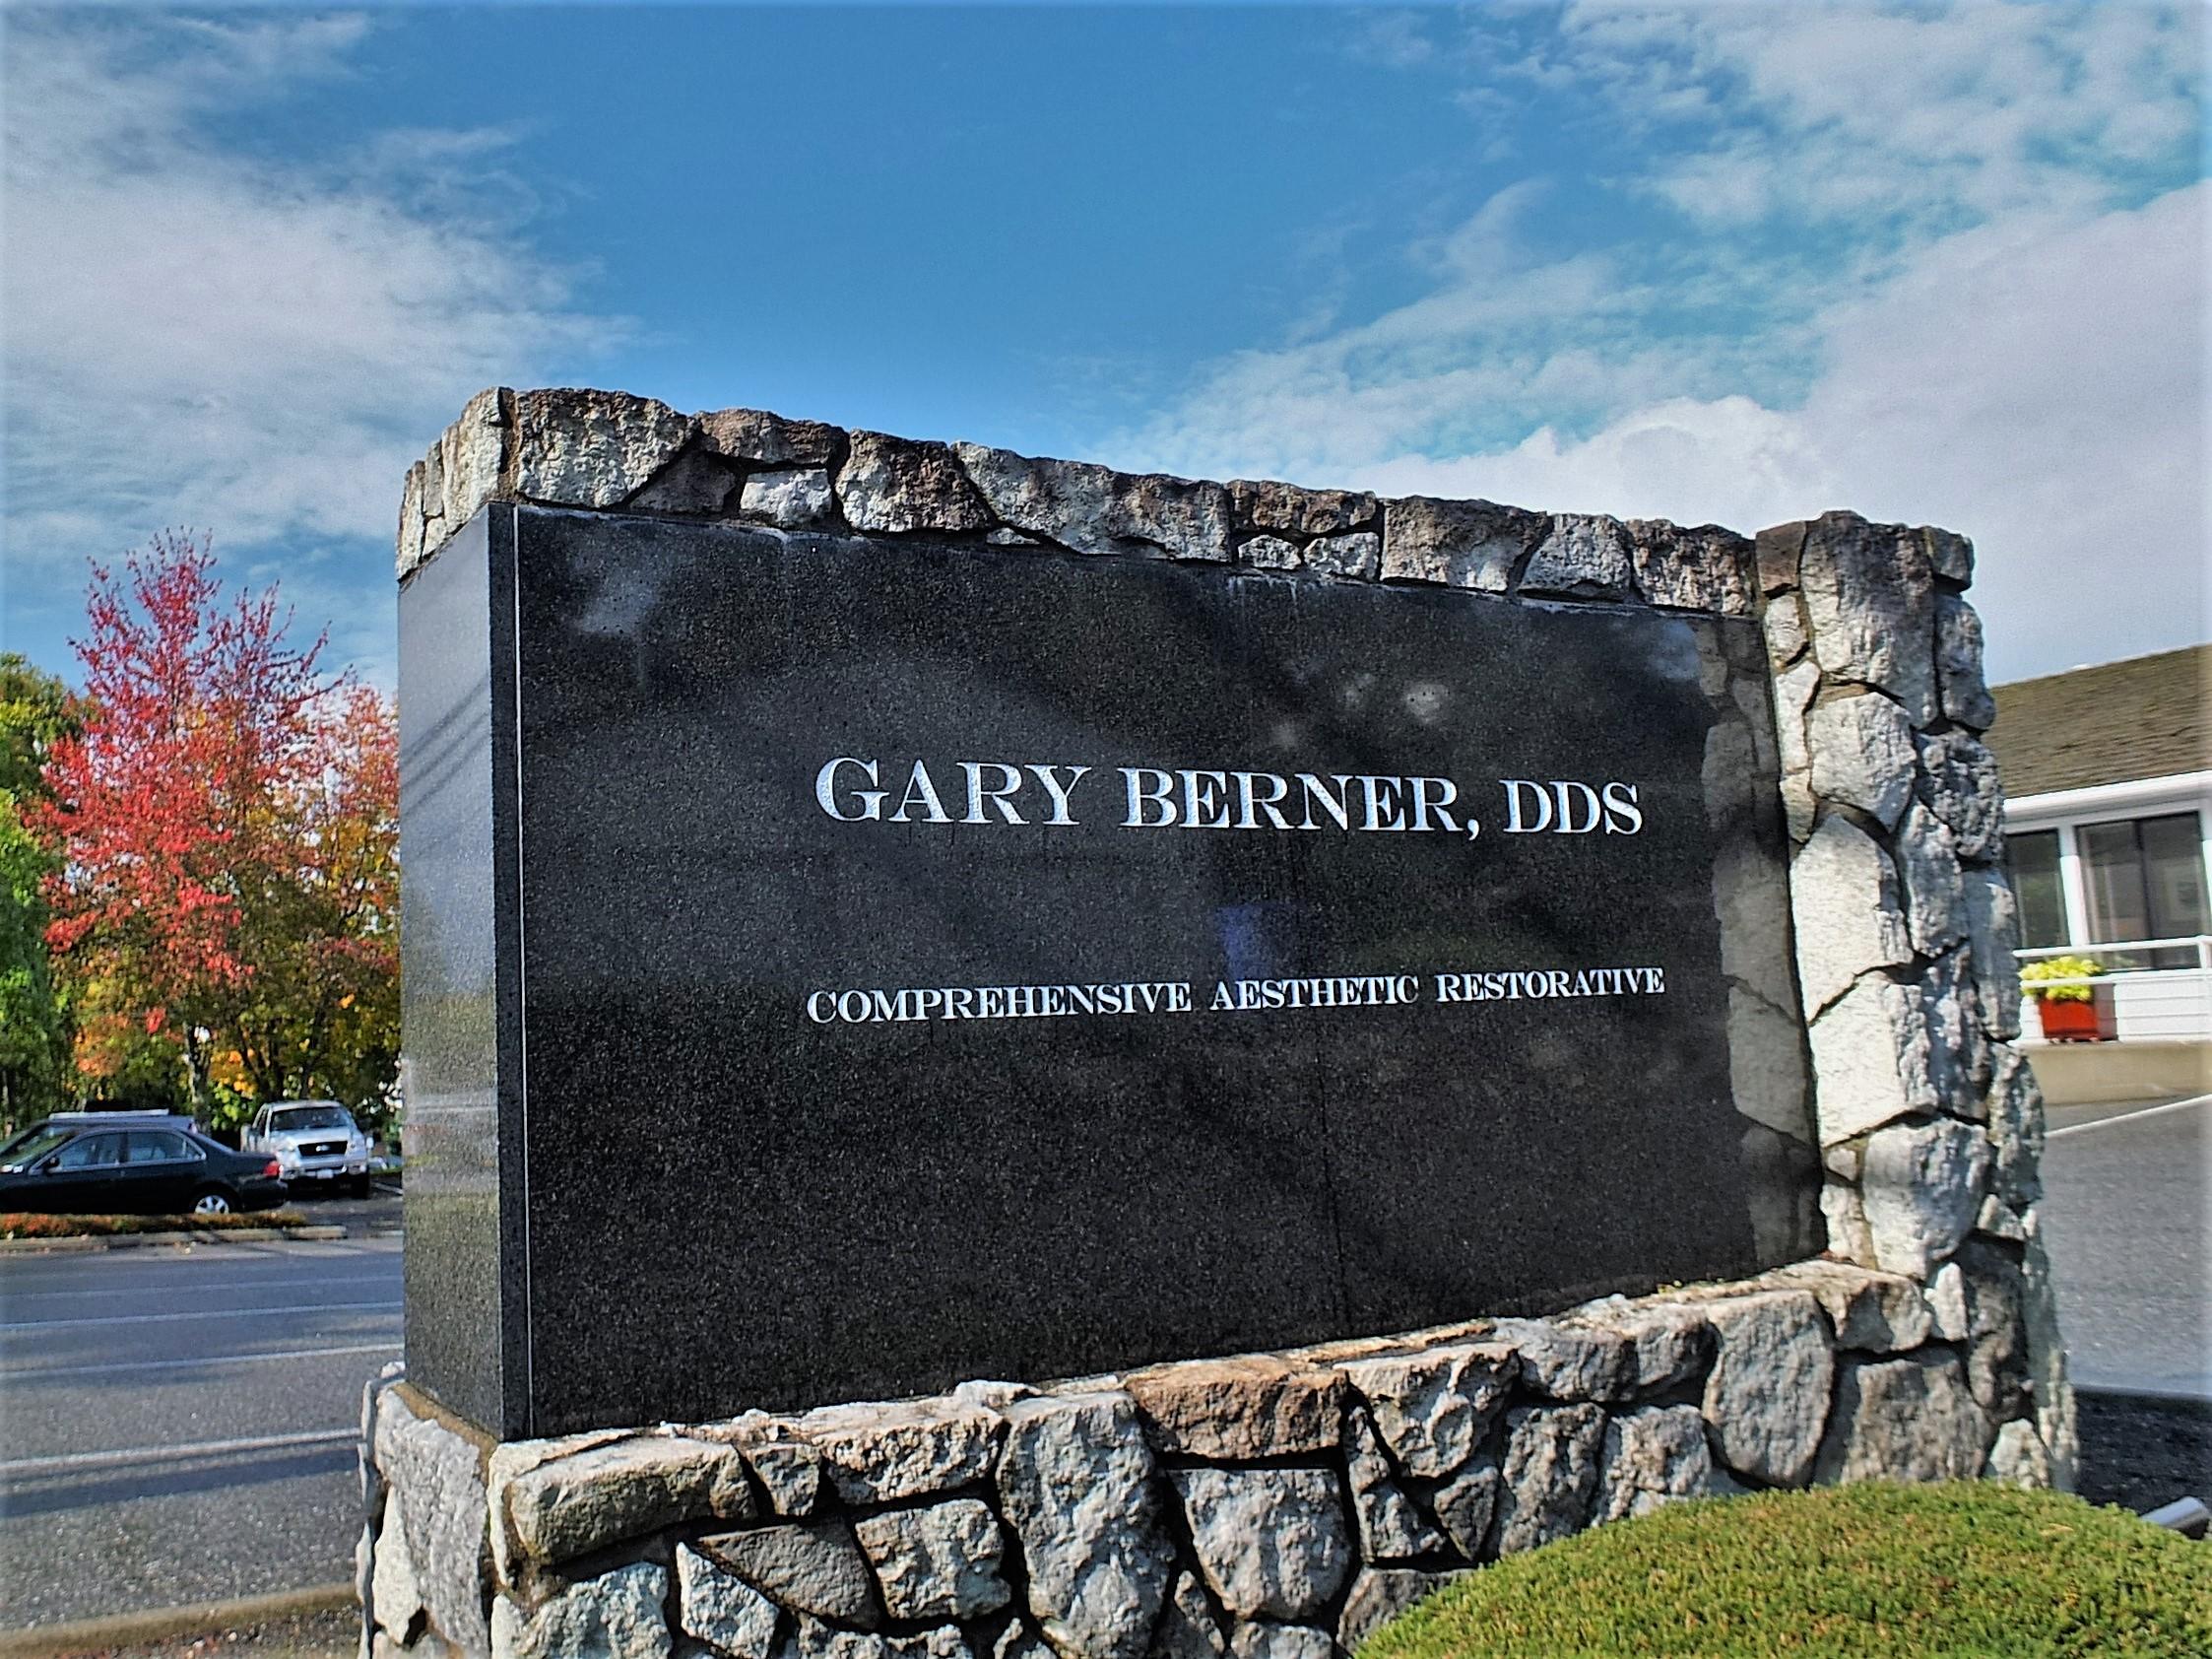 Gary Berner, DDS